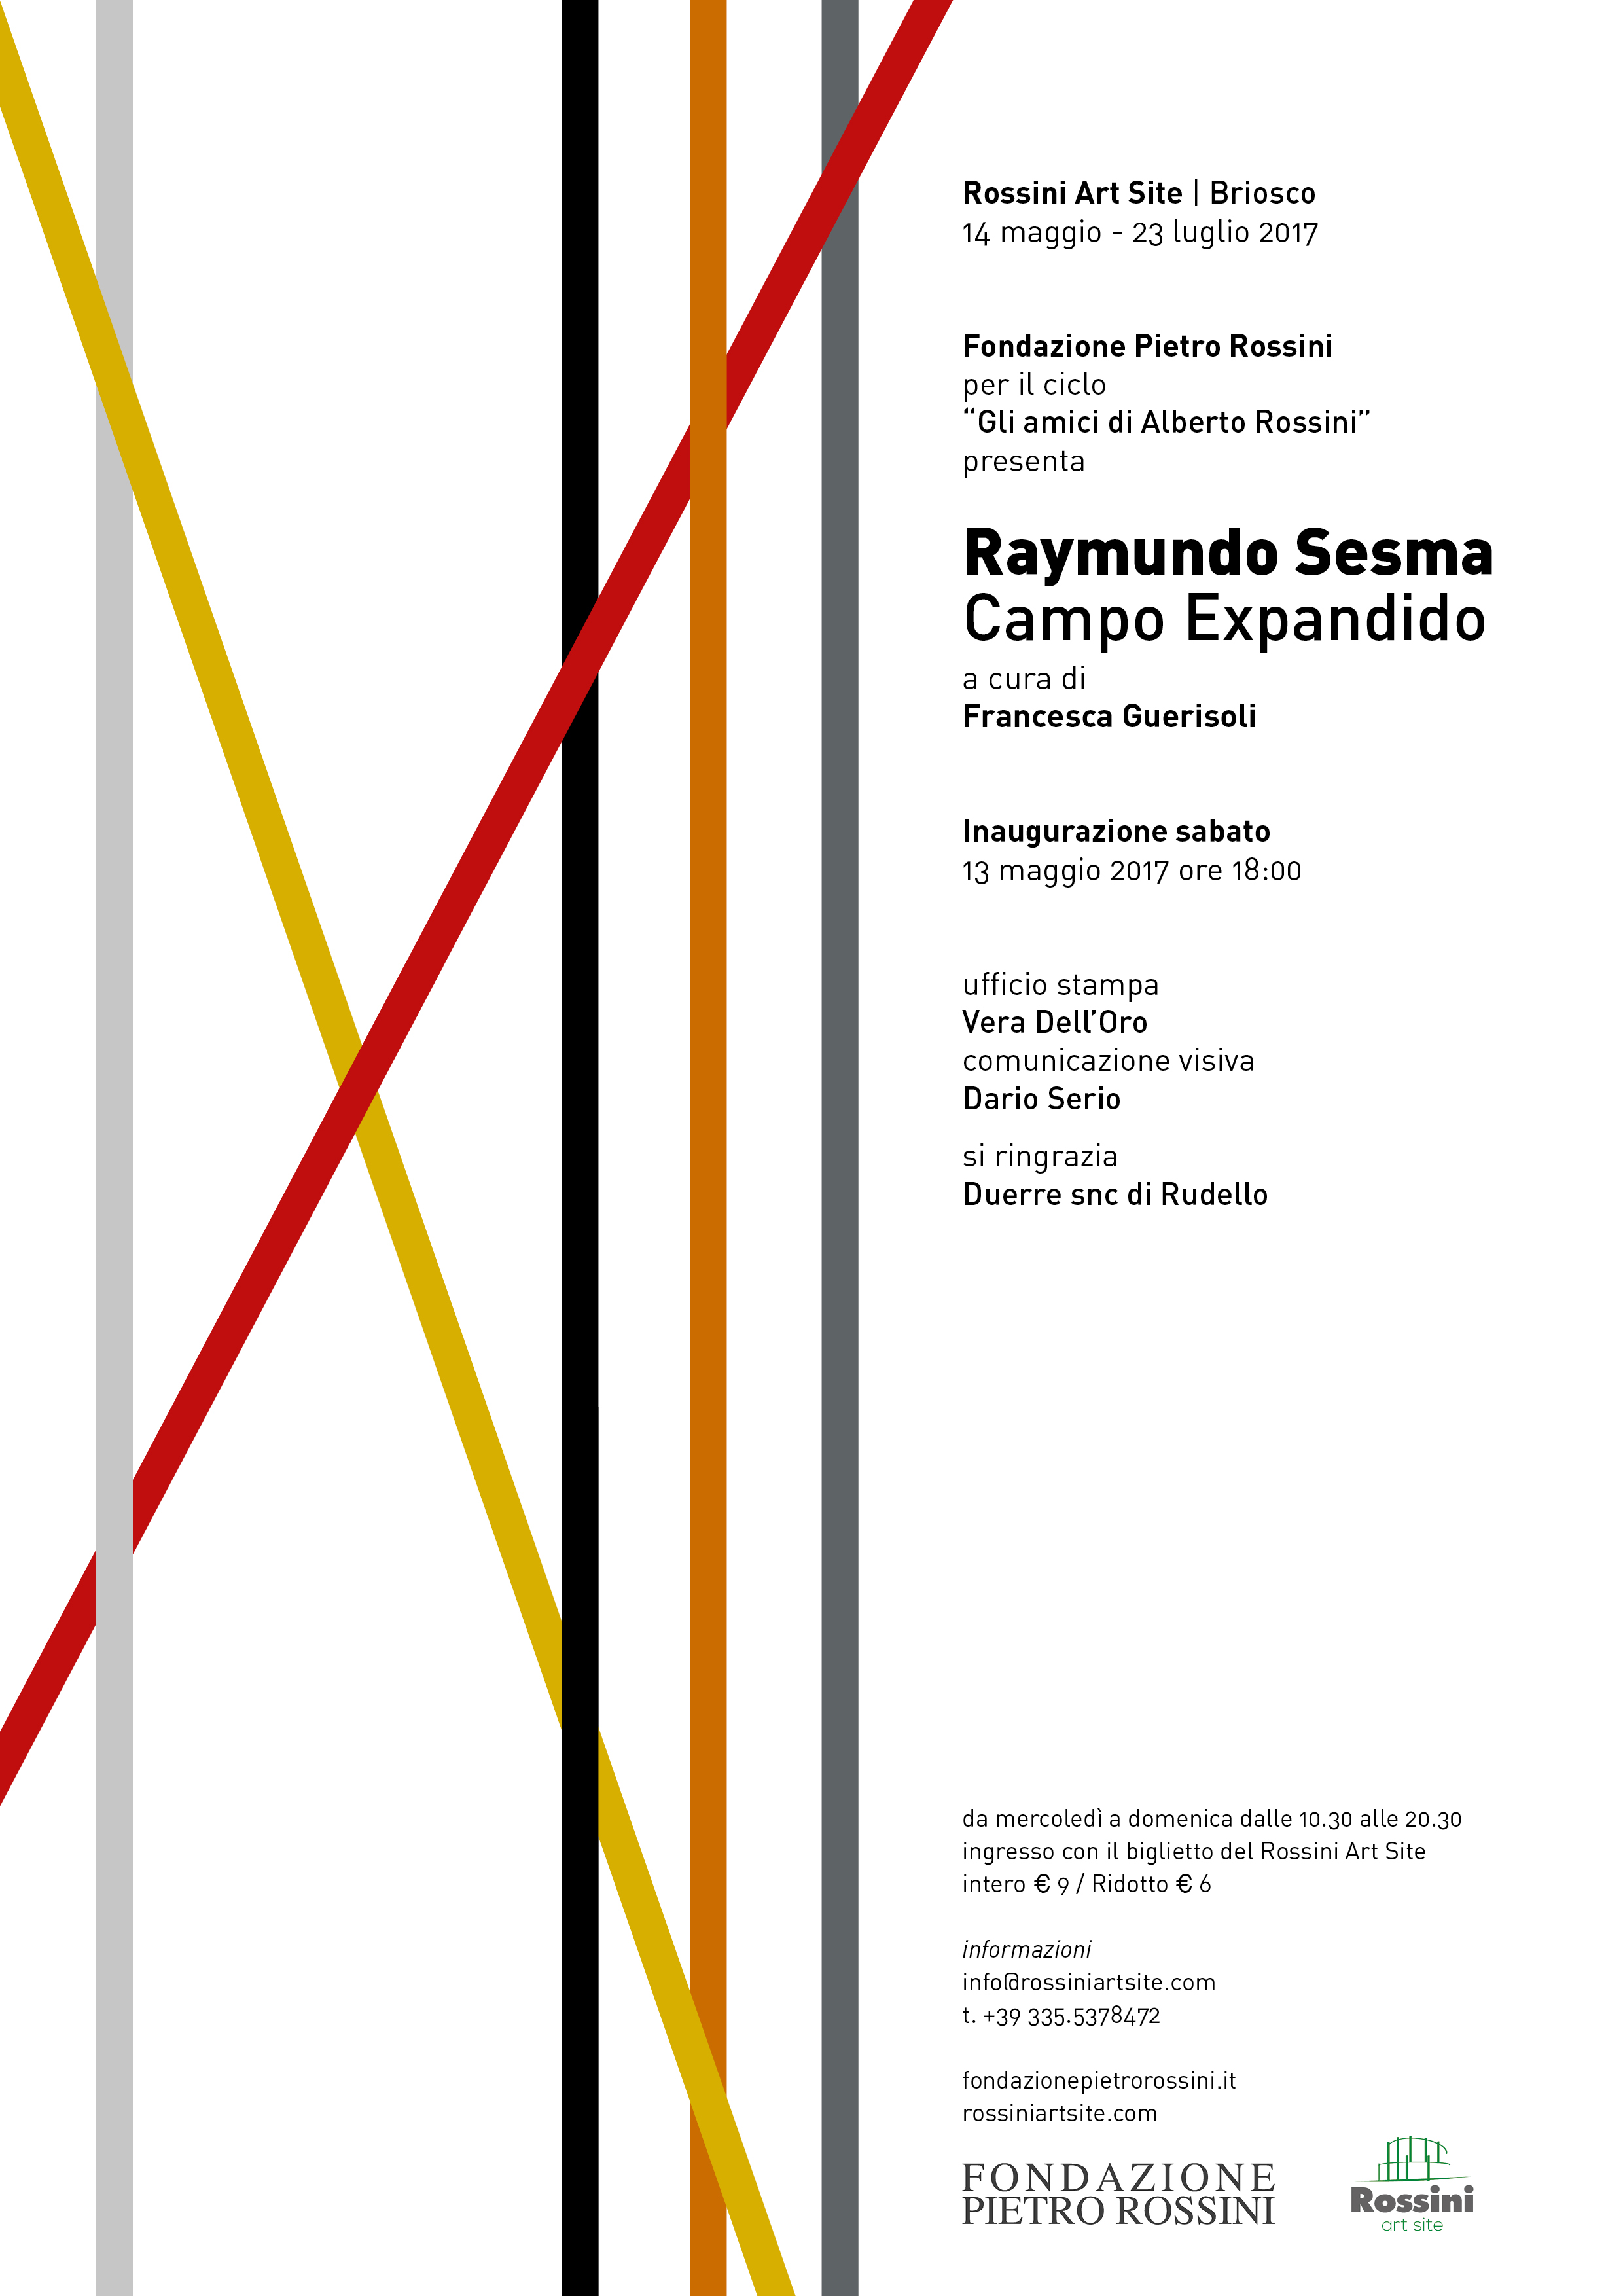 RaymundoSesma_CS_A4_Ita_Web_ok3.jpg